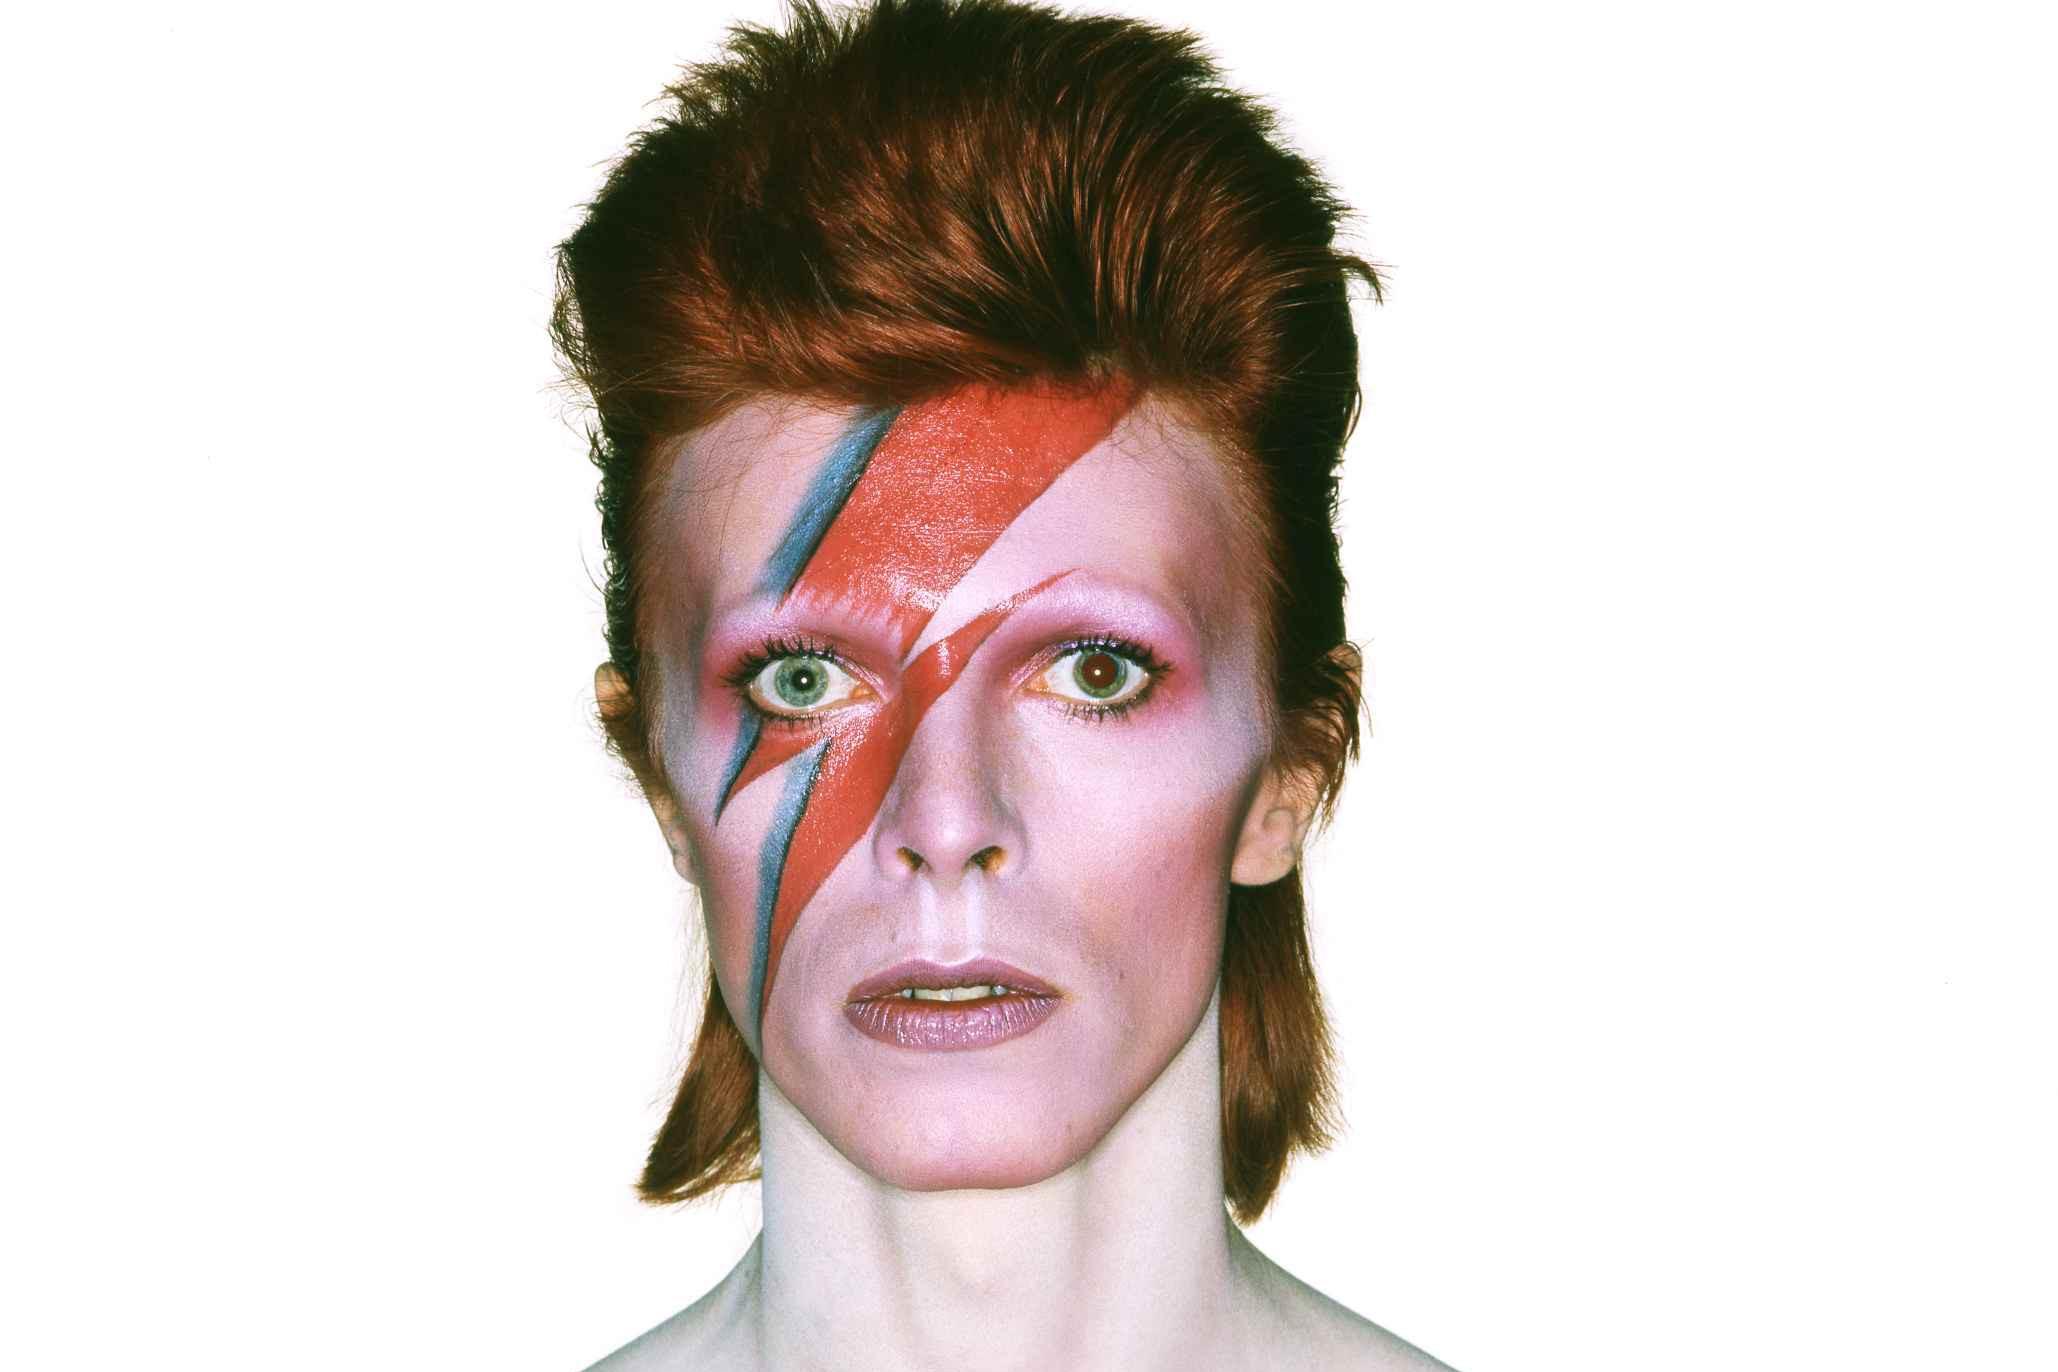 David Bowie aladdinsane